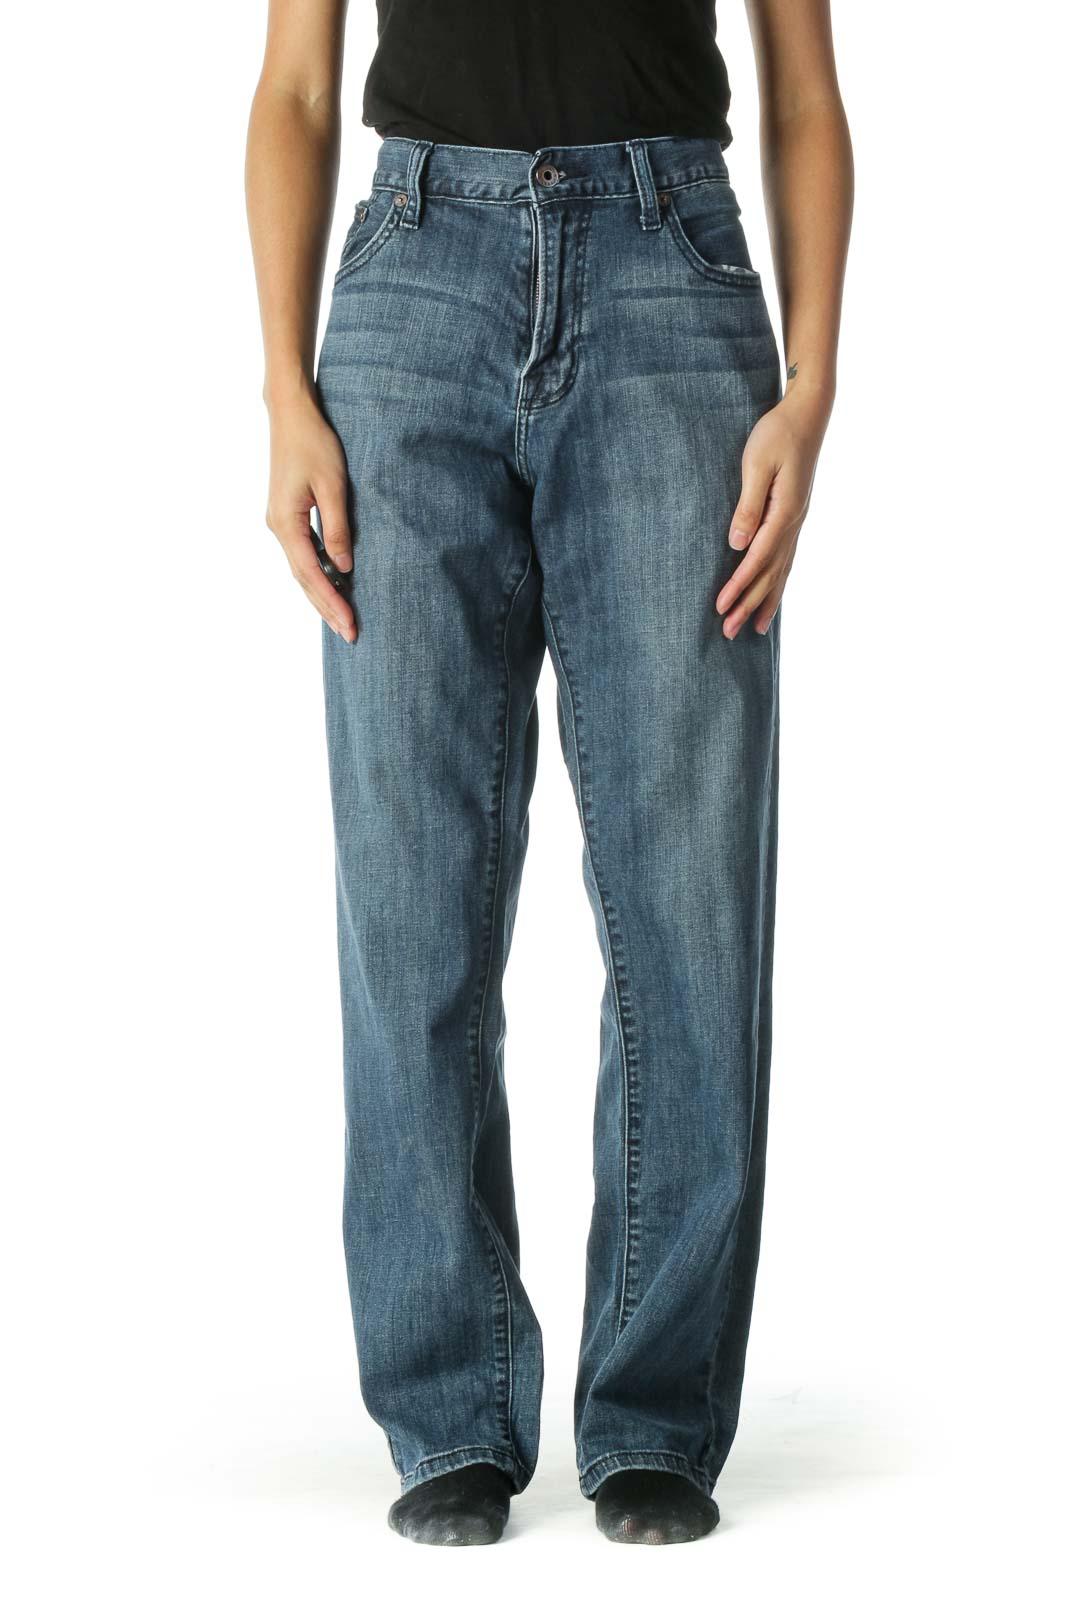 Blue Medium Wash Straight Leg Jeansq